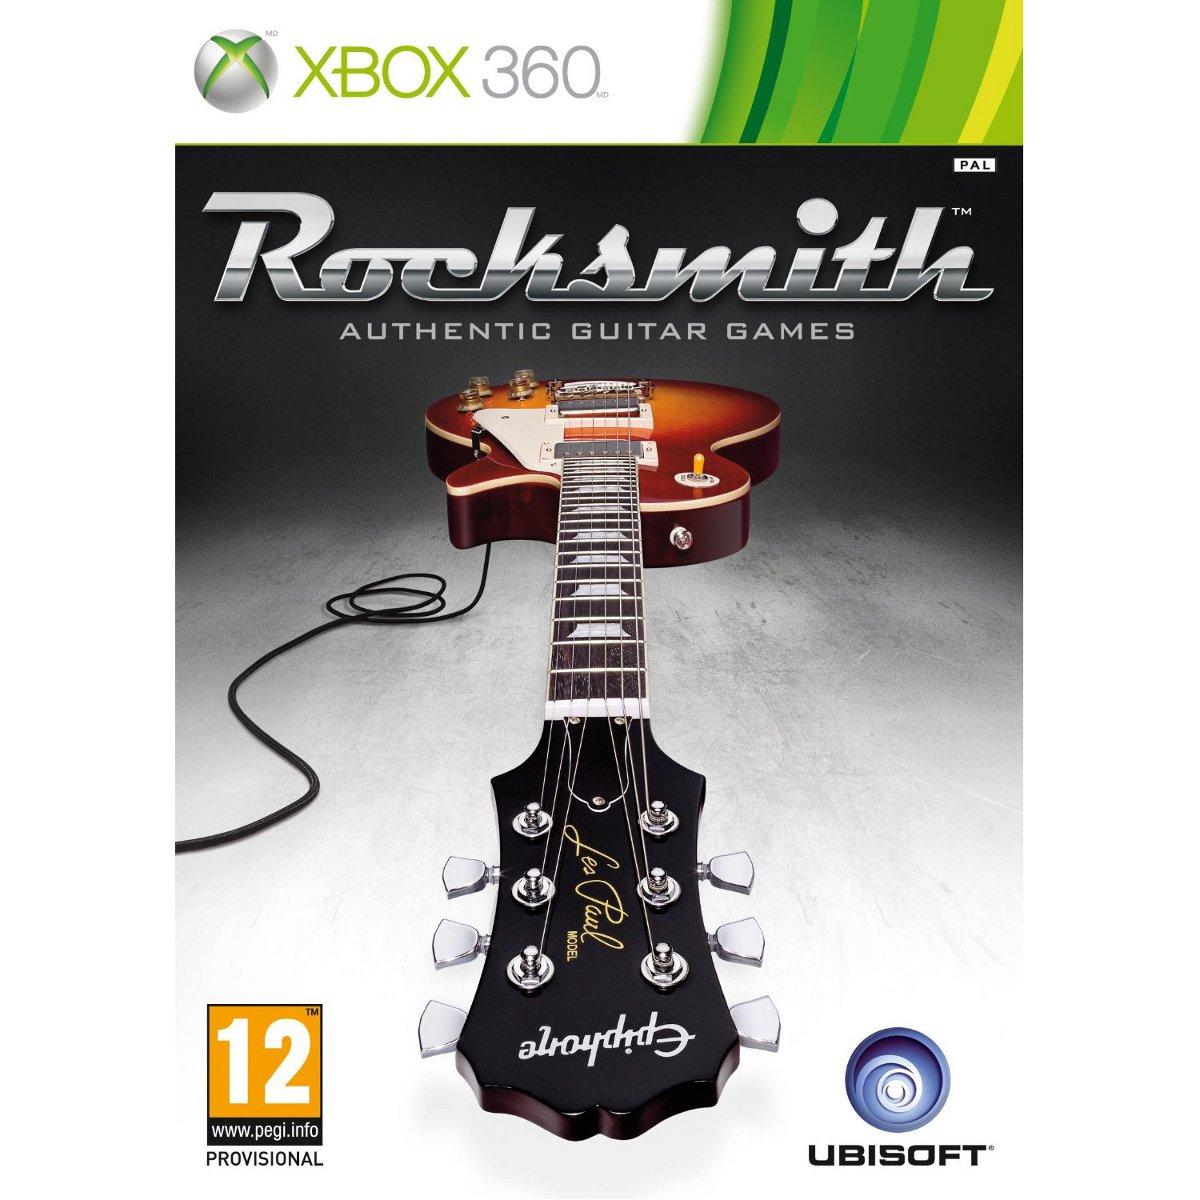 Rocksmith Cable Real Tone Xbox 360 GU02967 Achat Vente Jeux Xbox 360 Sur